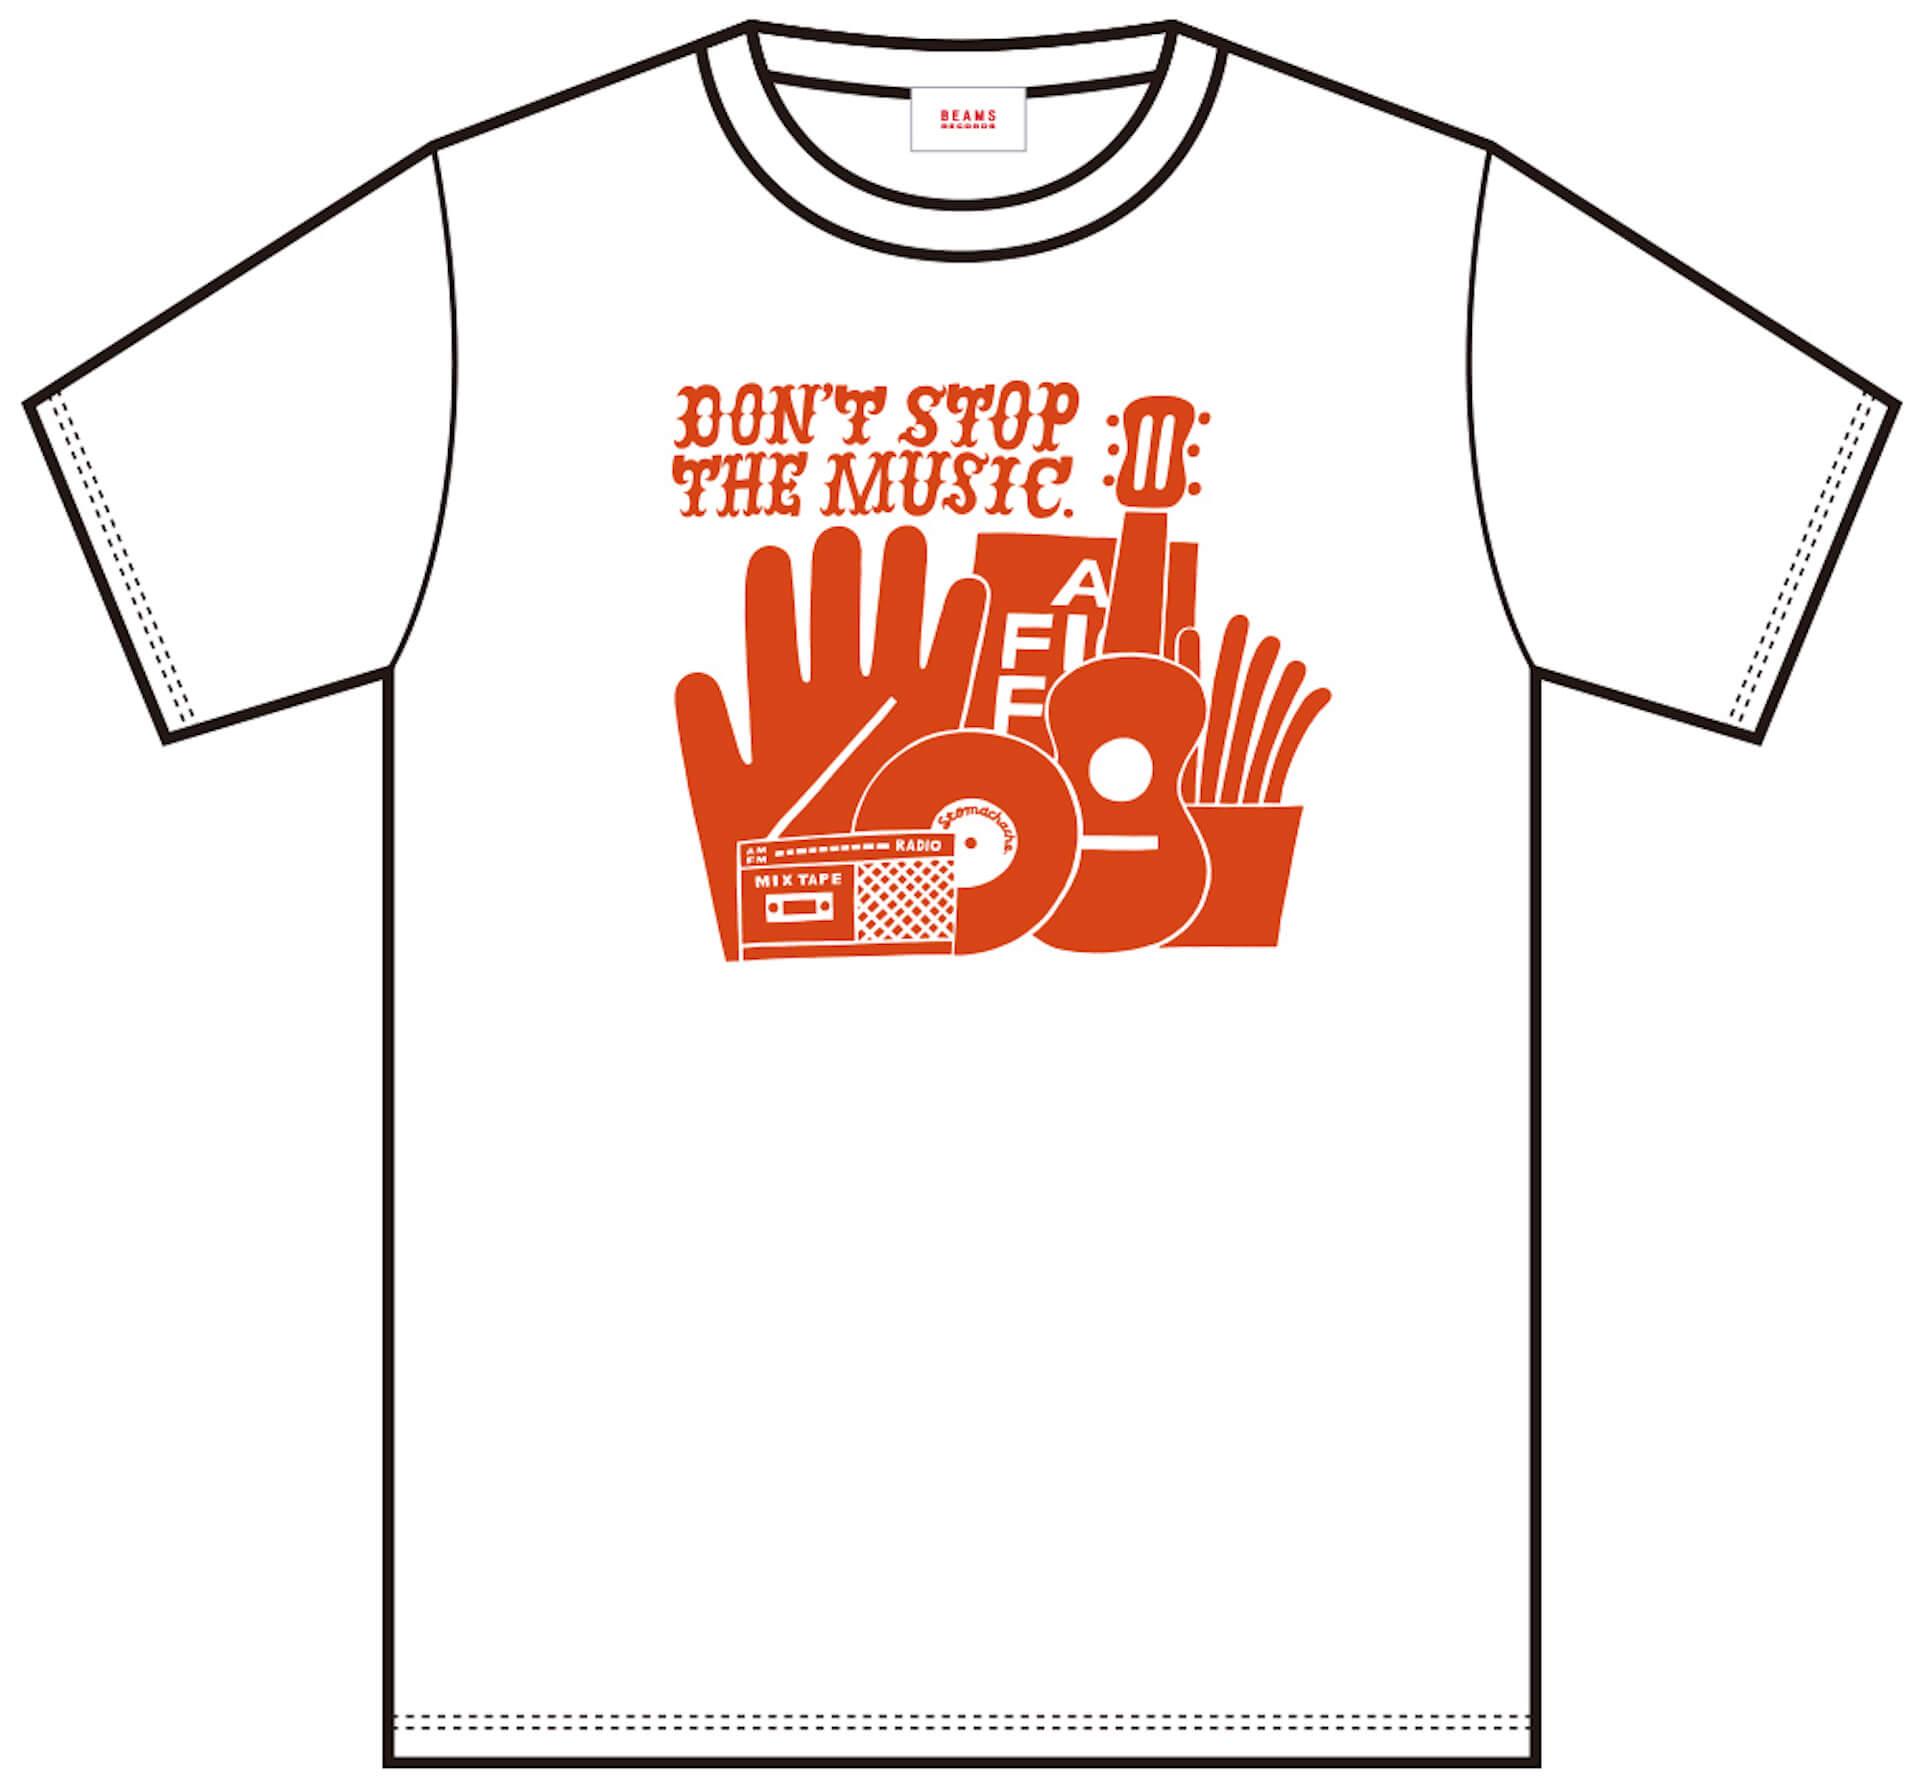 J-WAVE「#音楽を止めるな」BEAMS RECORDS協力のもと、ライブハウスを支援するオリジナルTシャツが受注販売開始! lf200515_jwave_beamsrecords_tshirts_03